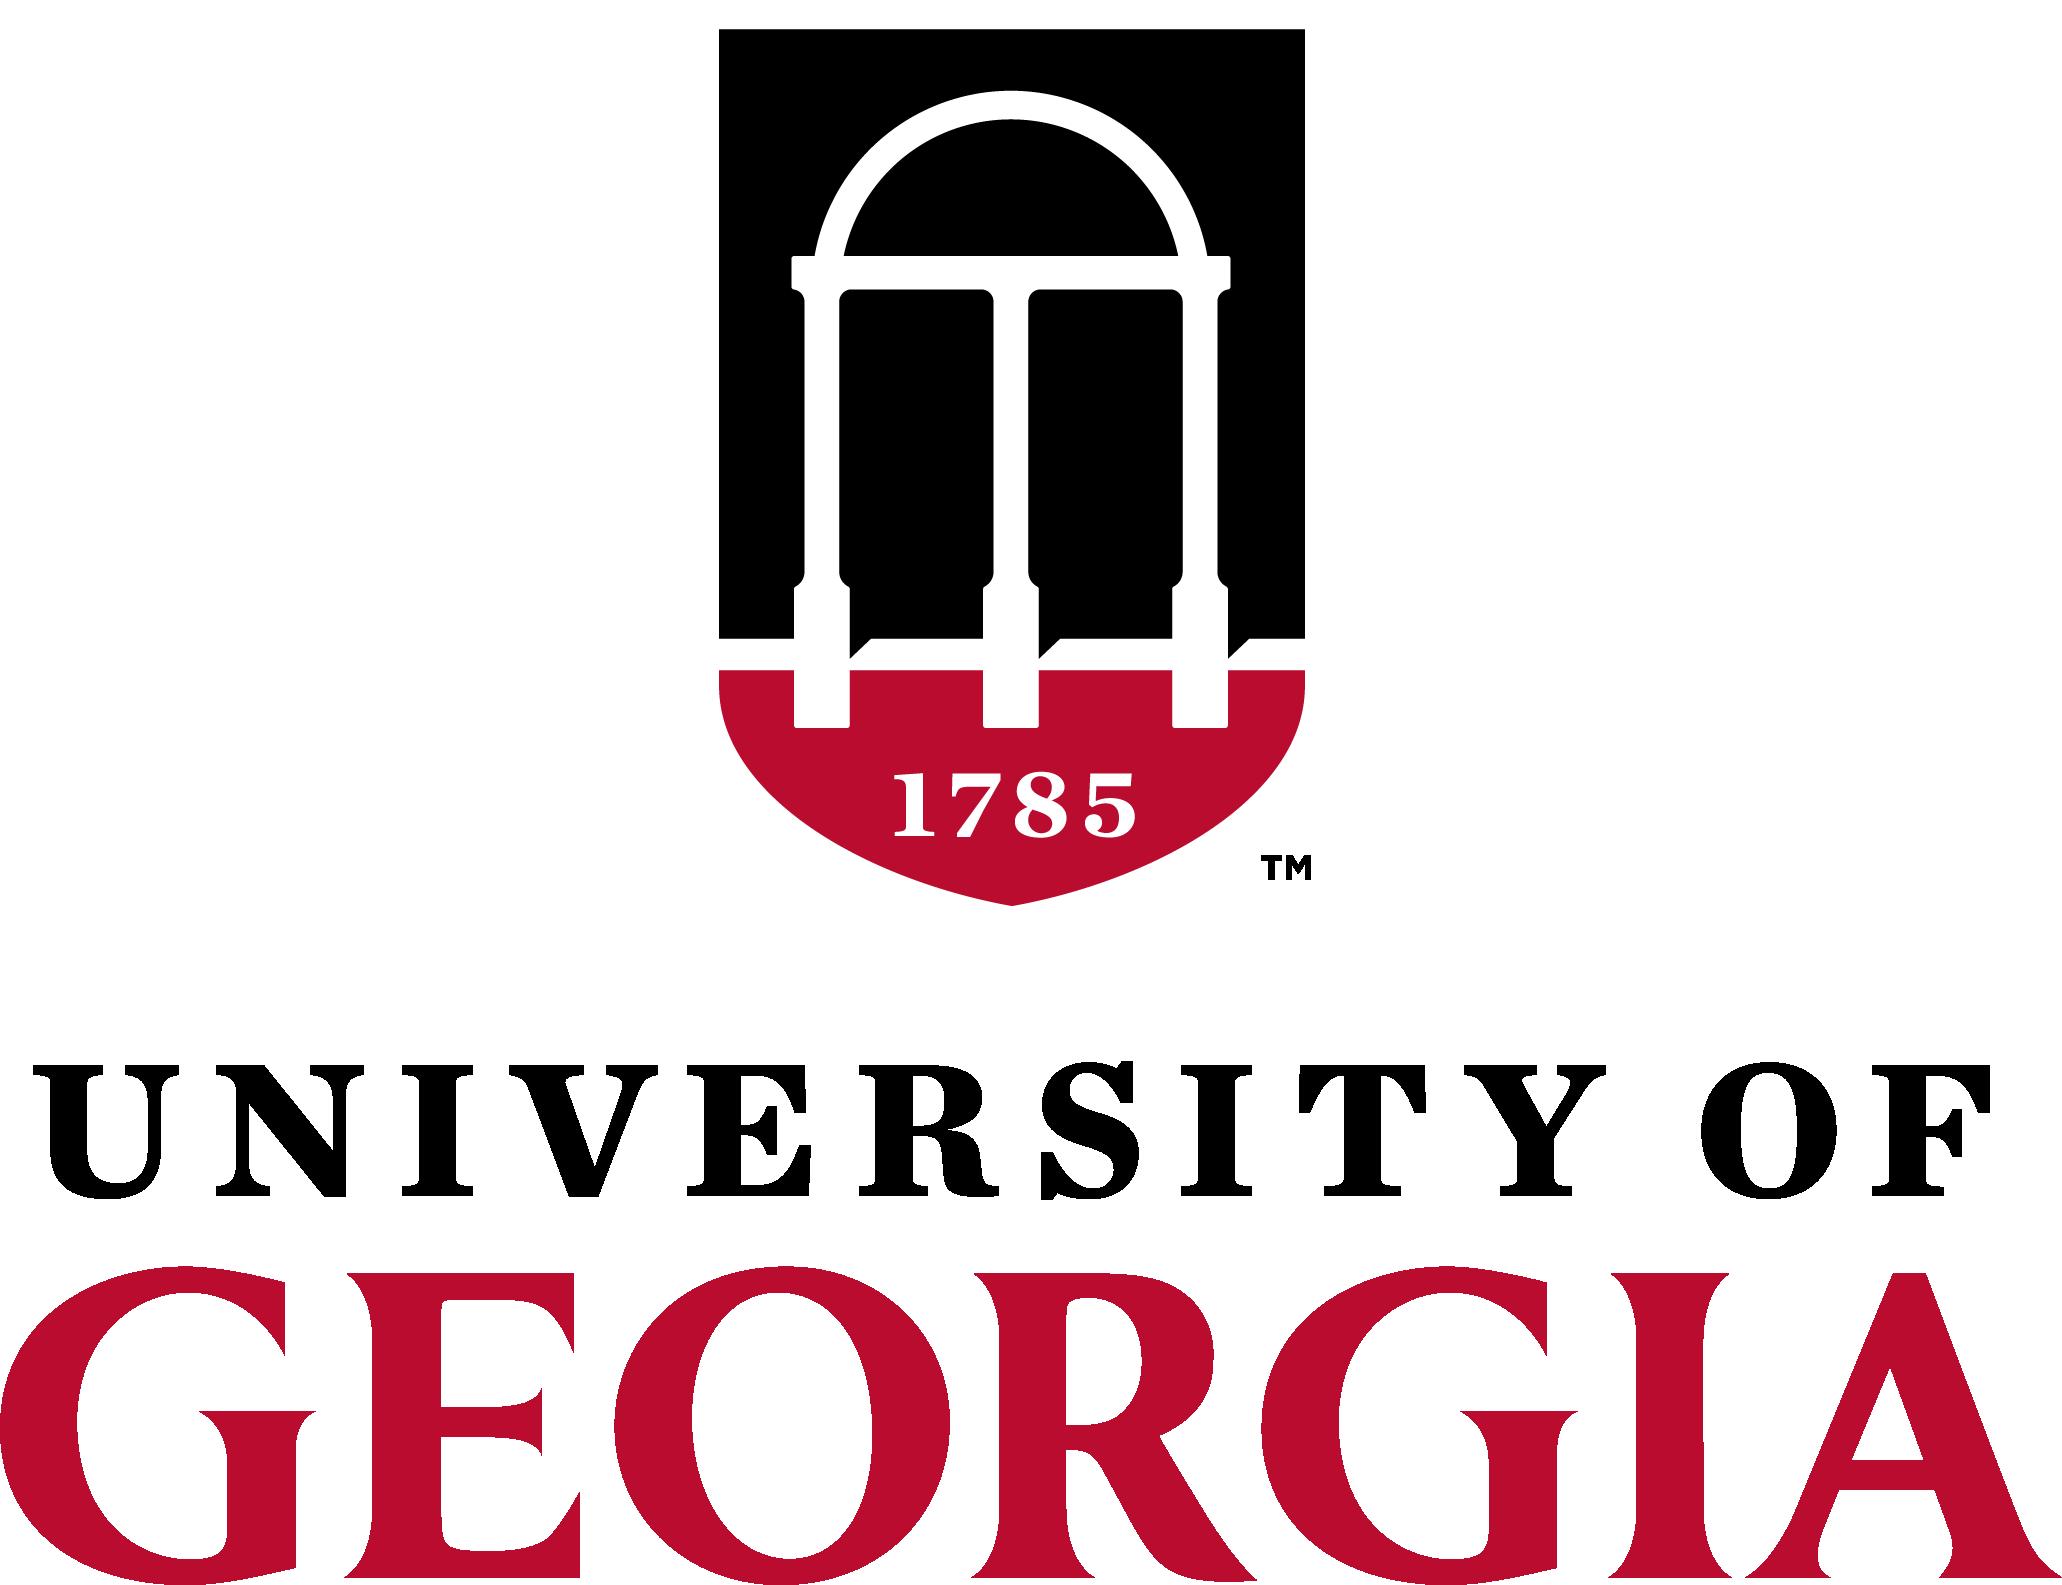 Georgia football clipart vector free stock University Logos and Marks | Brand Toolkit | University of Georgia vector free stock